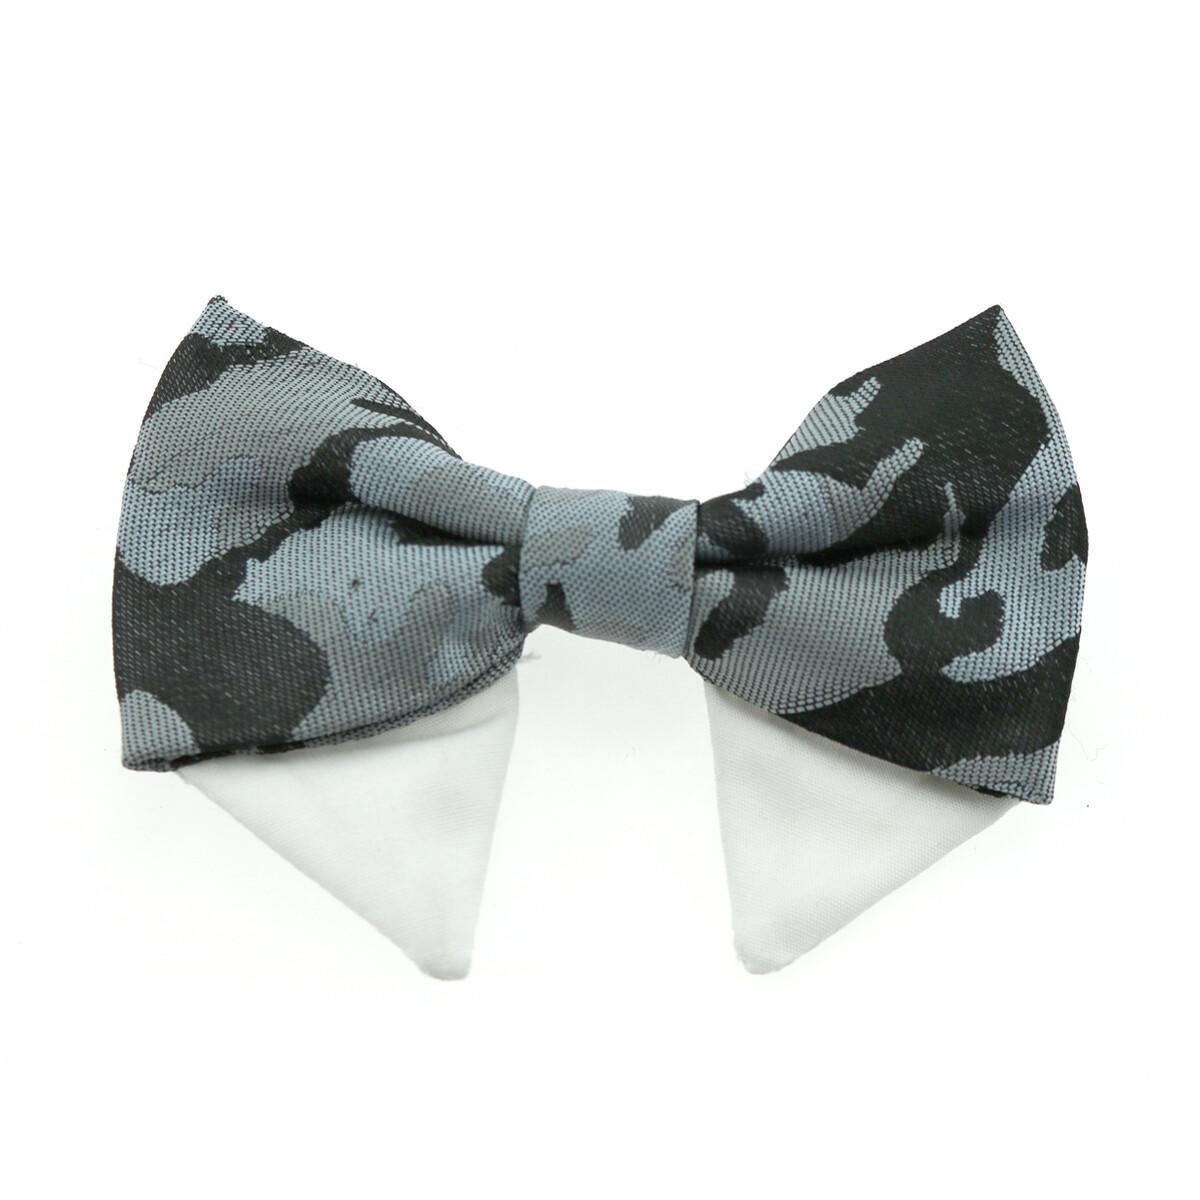 Universal Dog Bow Tie - Gray Camo